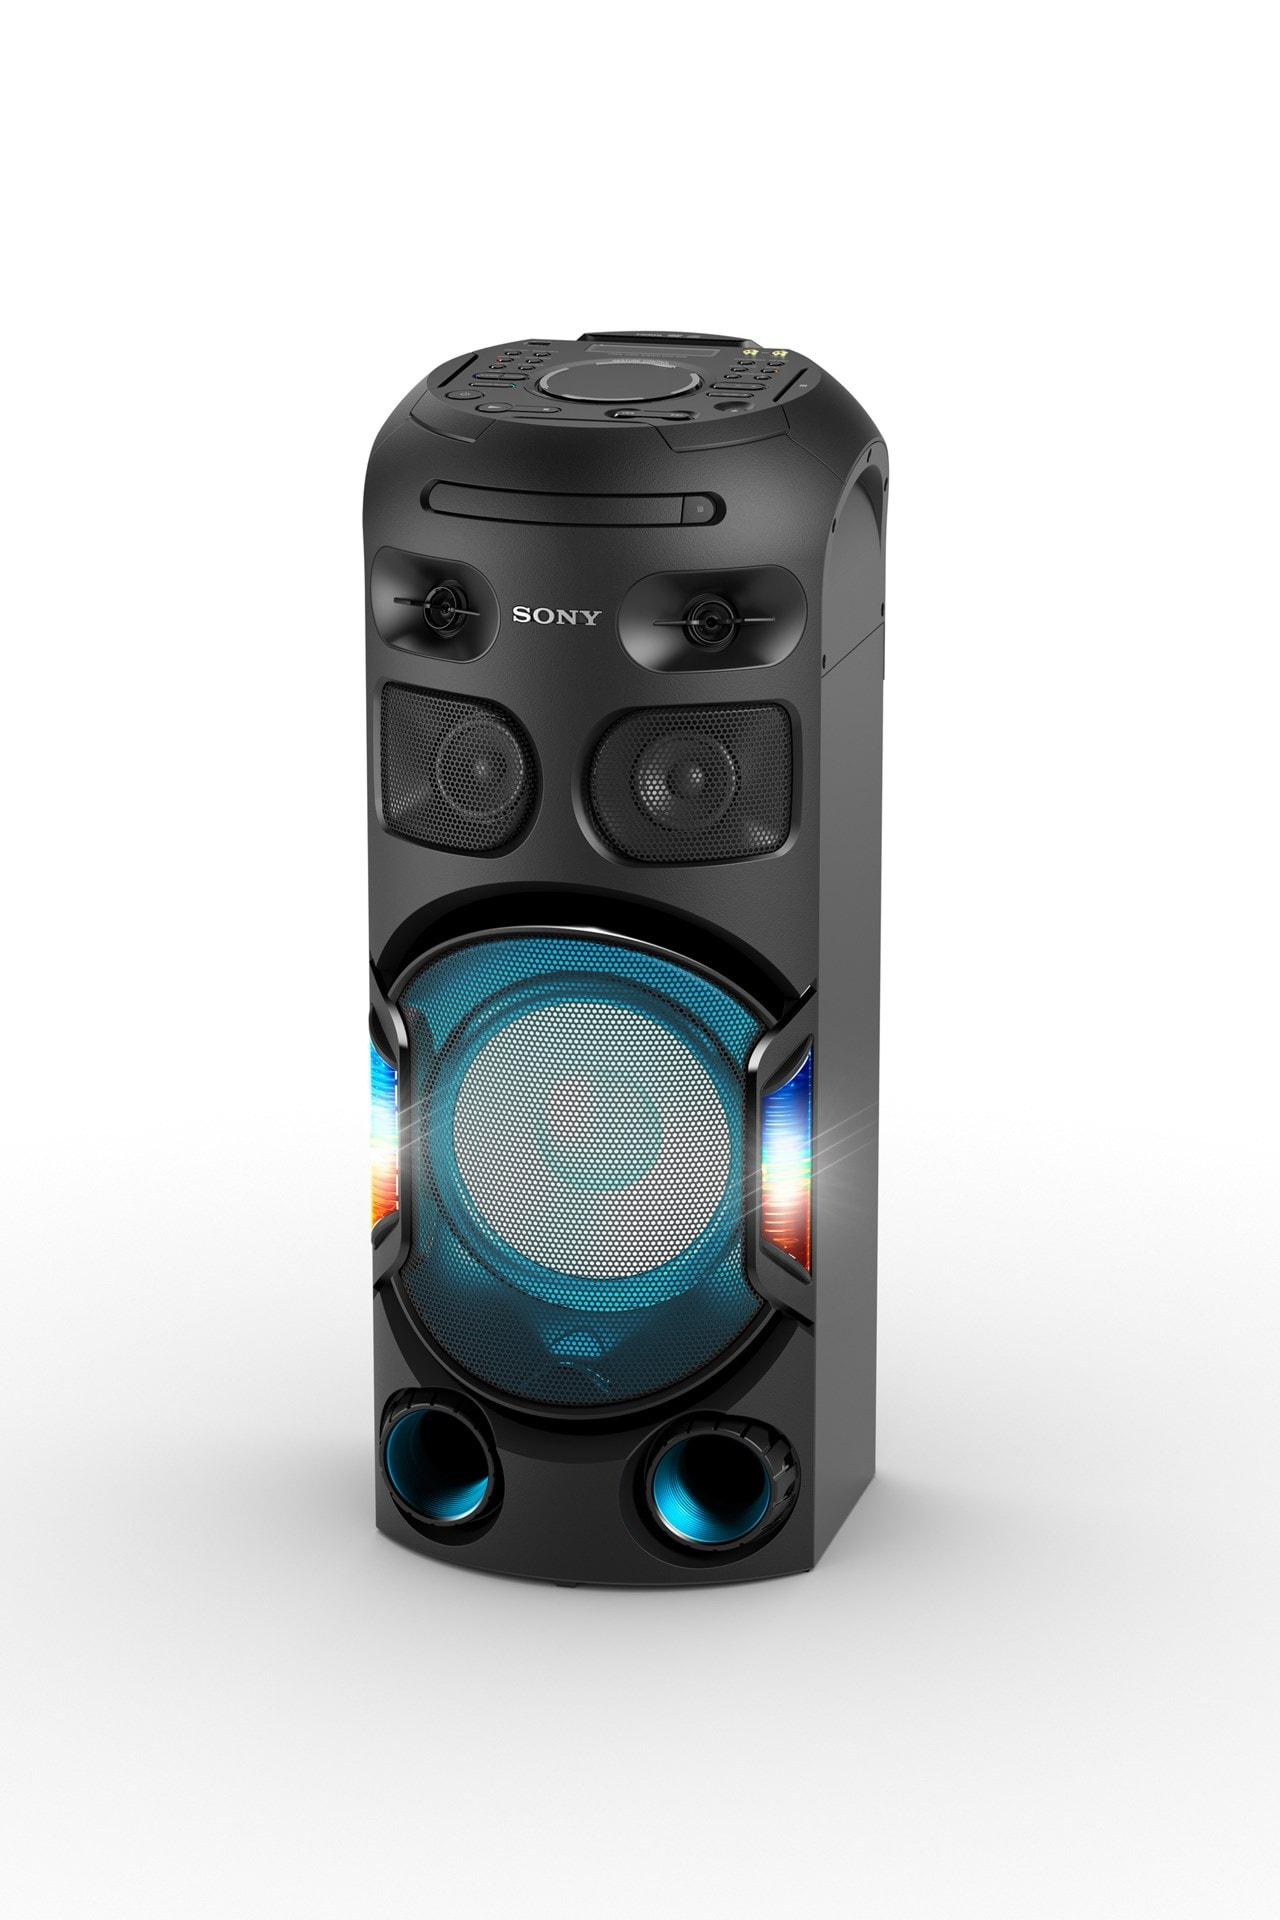 Sony MHCV42D High Power Bluetooth Audio System - 1